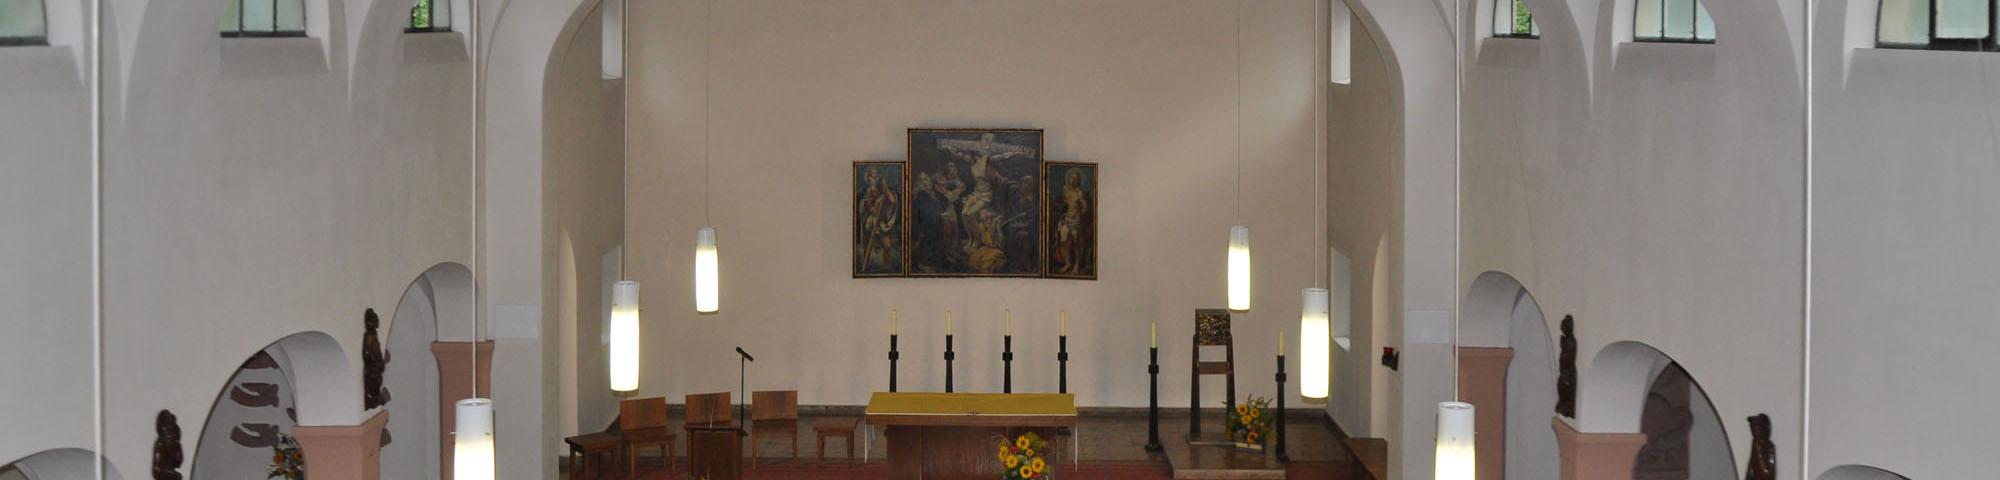 Kath. Kirche St. Georg Gohlis